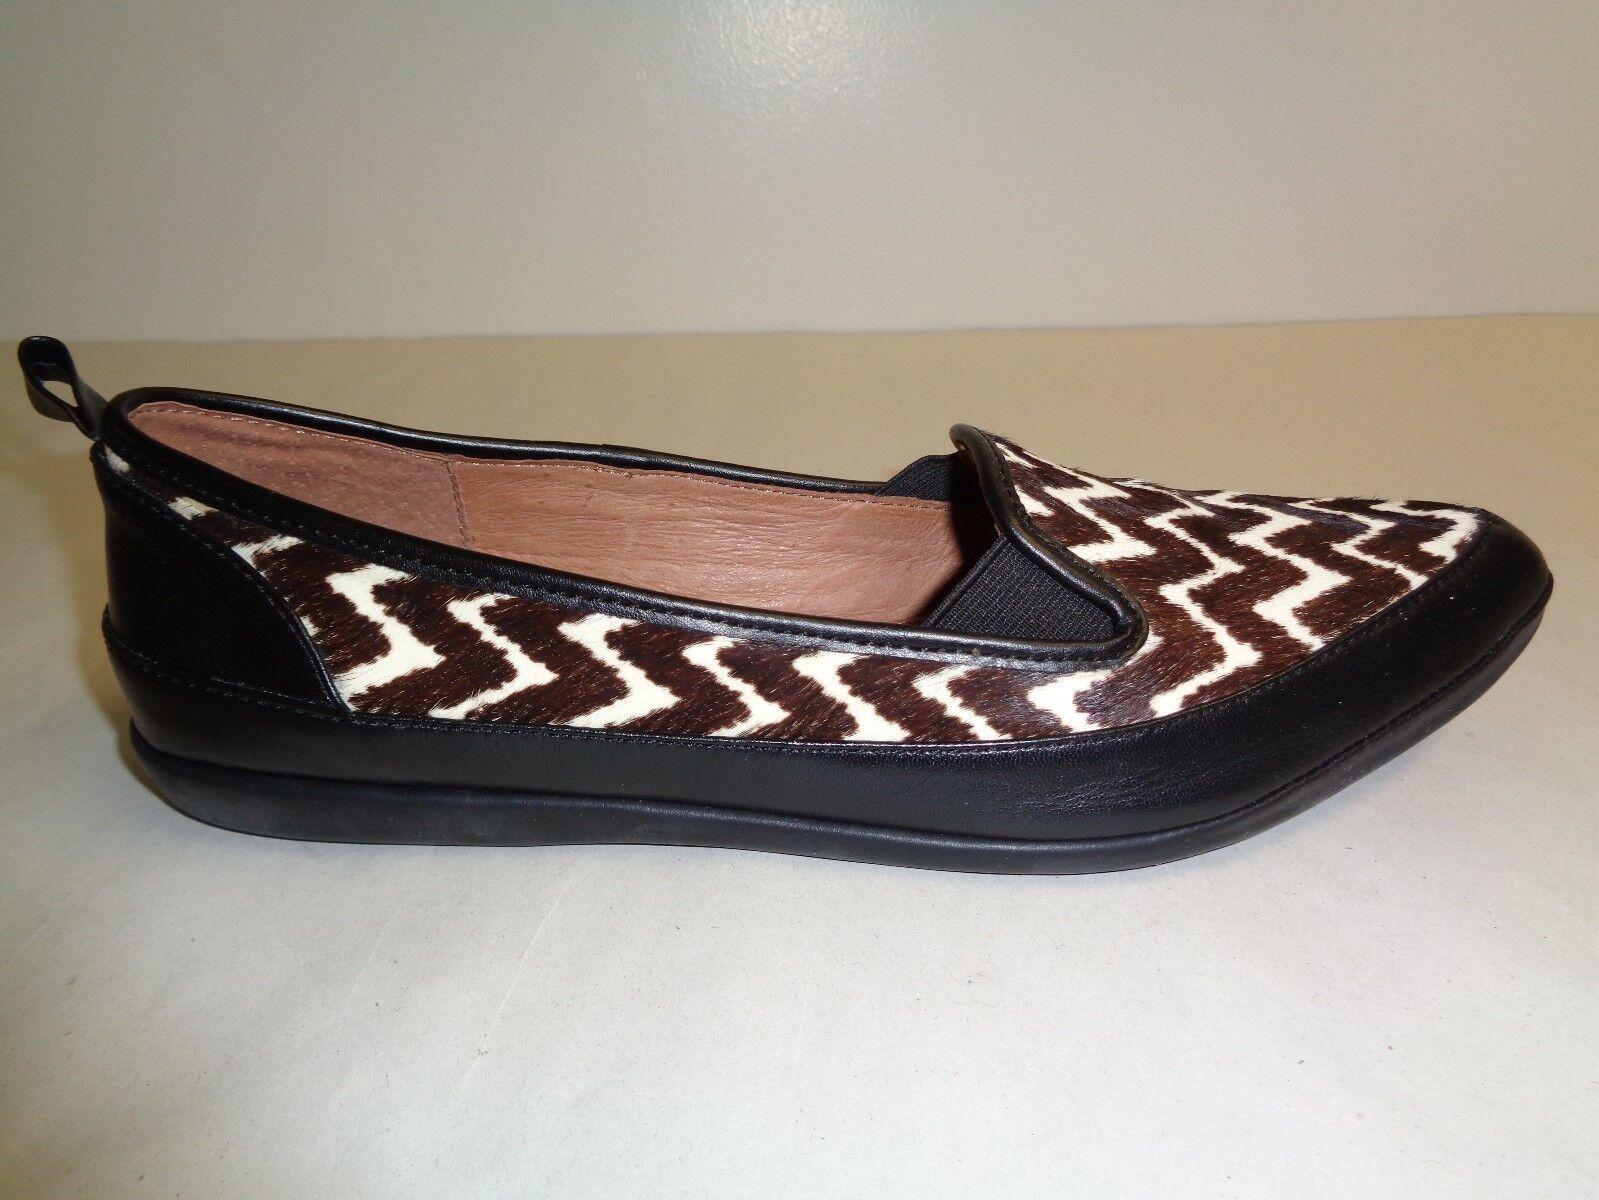 Adrianna Papell Size 6 M LENNOX Black Chevron Haircalf Flats New Womens shoes